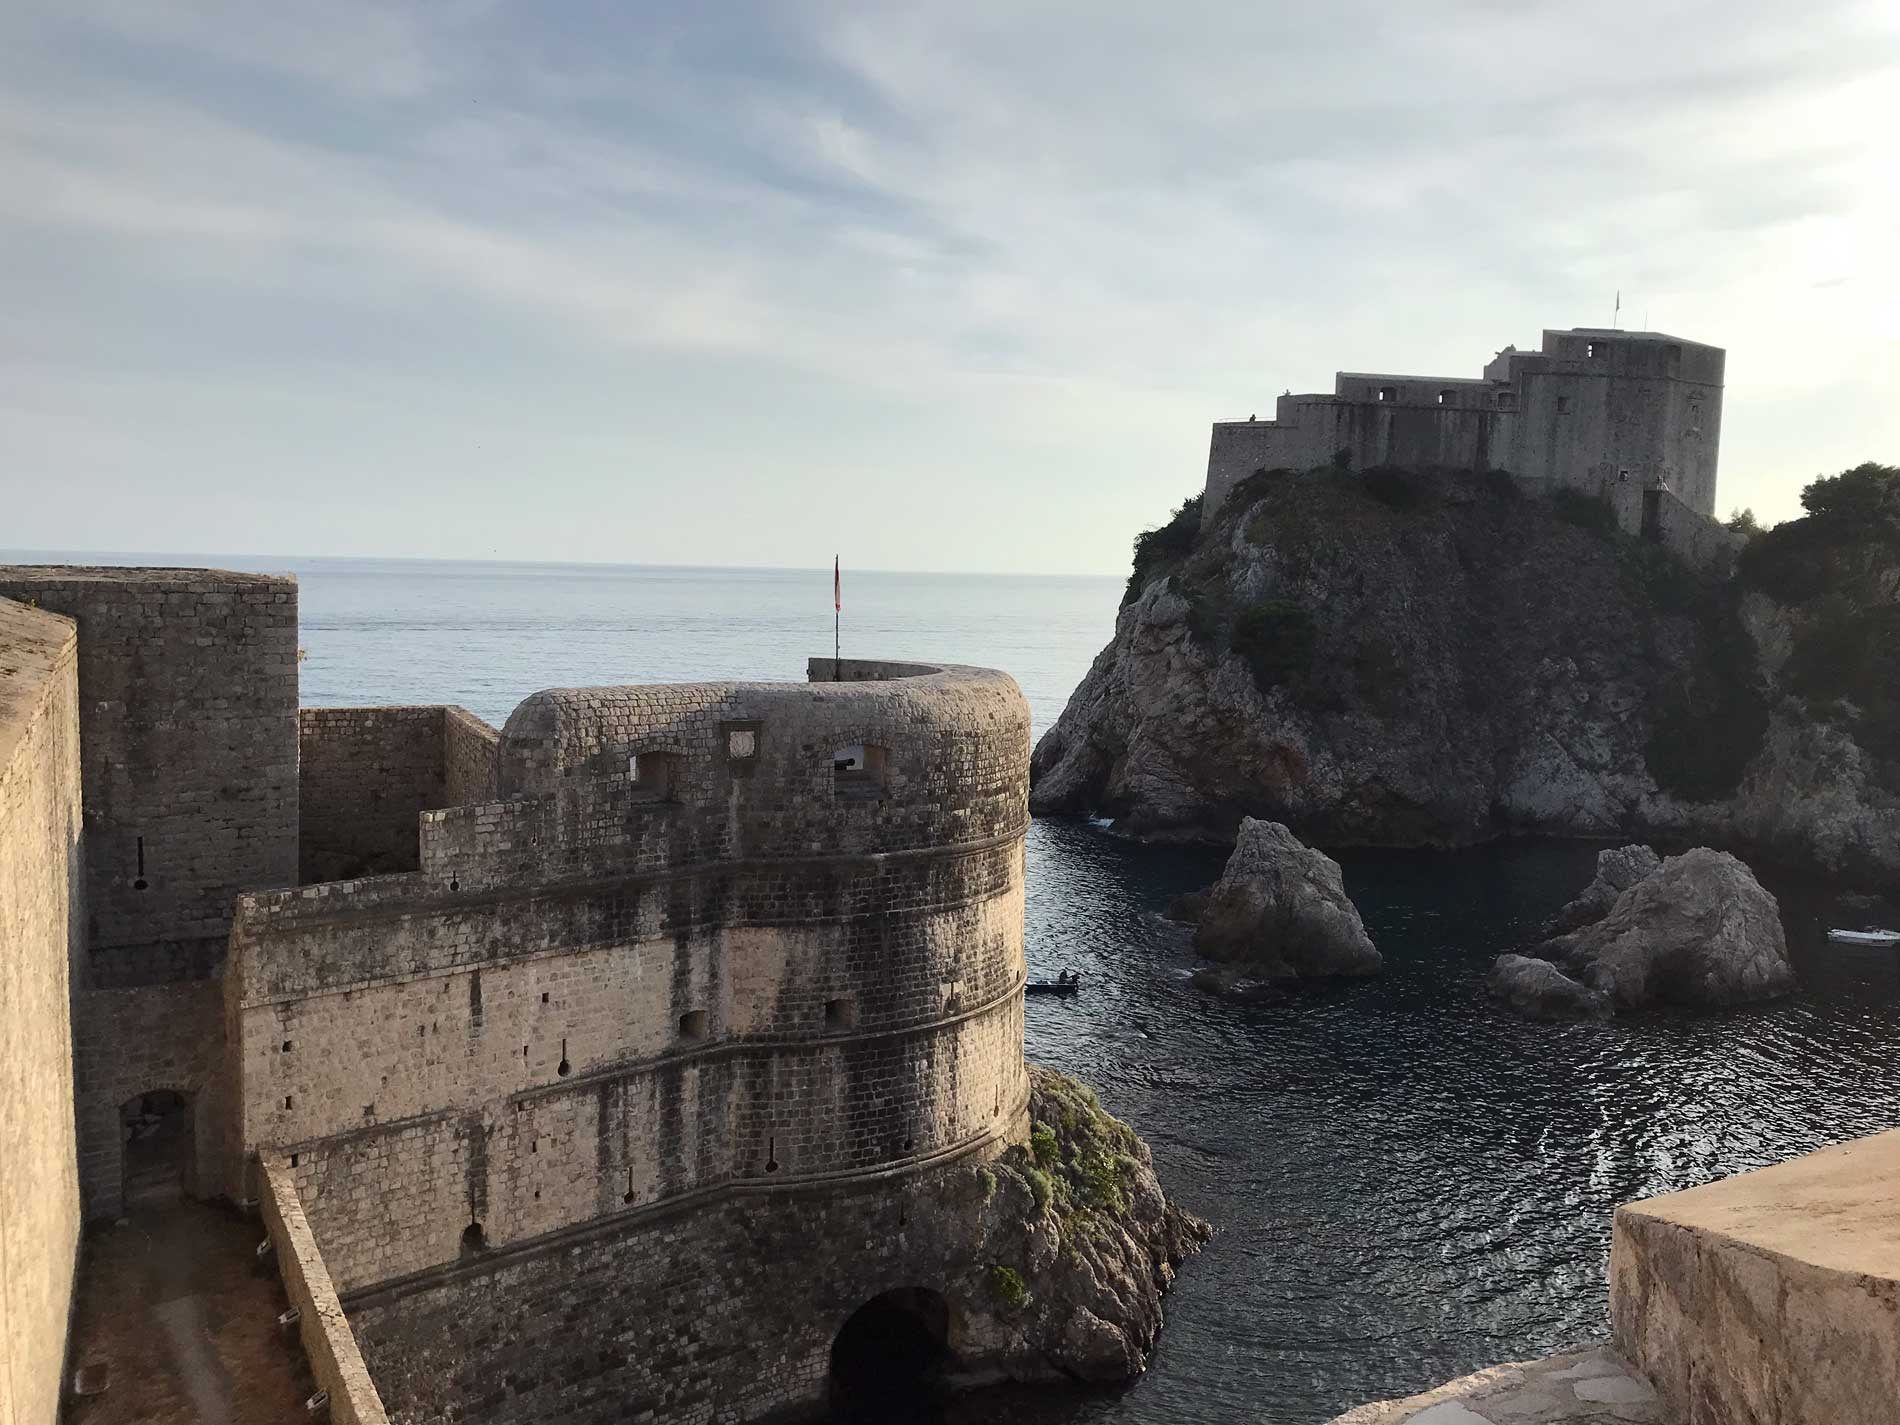 Dubrovnik-Croazia-vista-dalle-mura-Forte-Bokar-Forte-Lovrijenac-mare